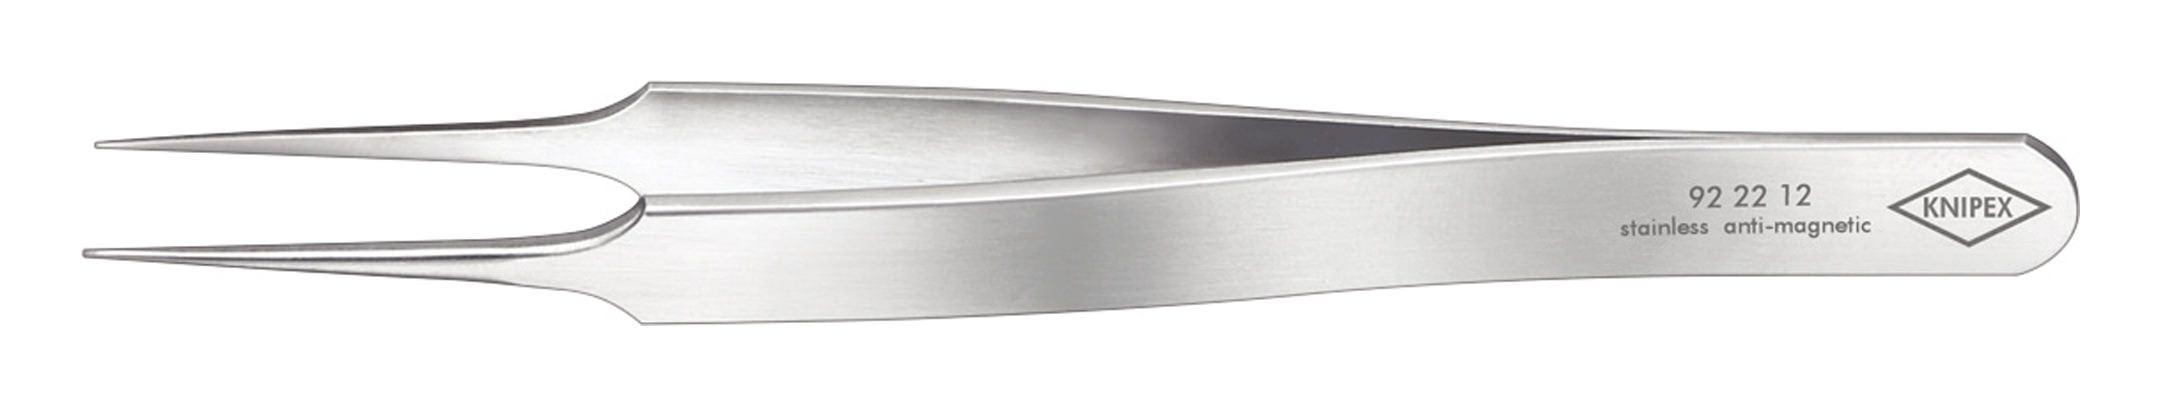 Knipex Präzisions-Pinzette Nadelform 105mm rostfrei - 92 22 12